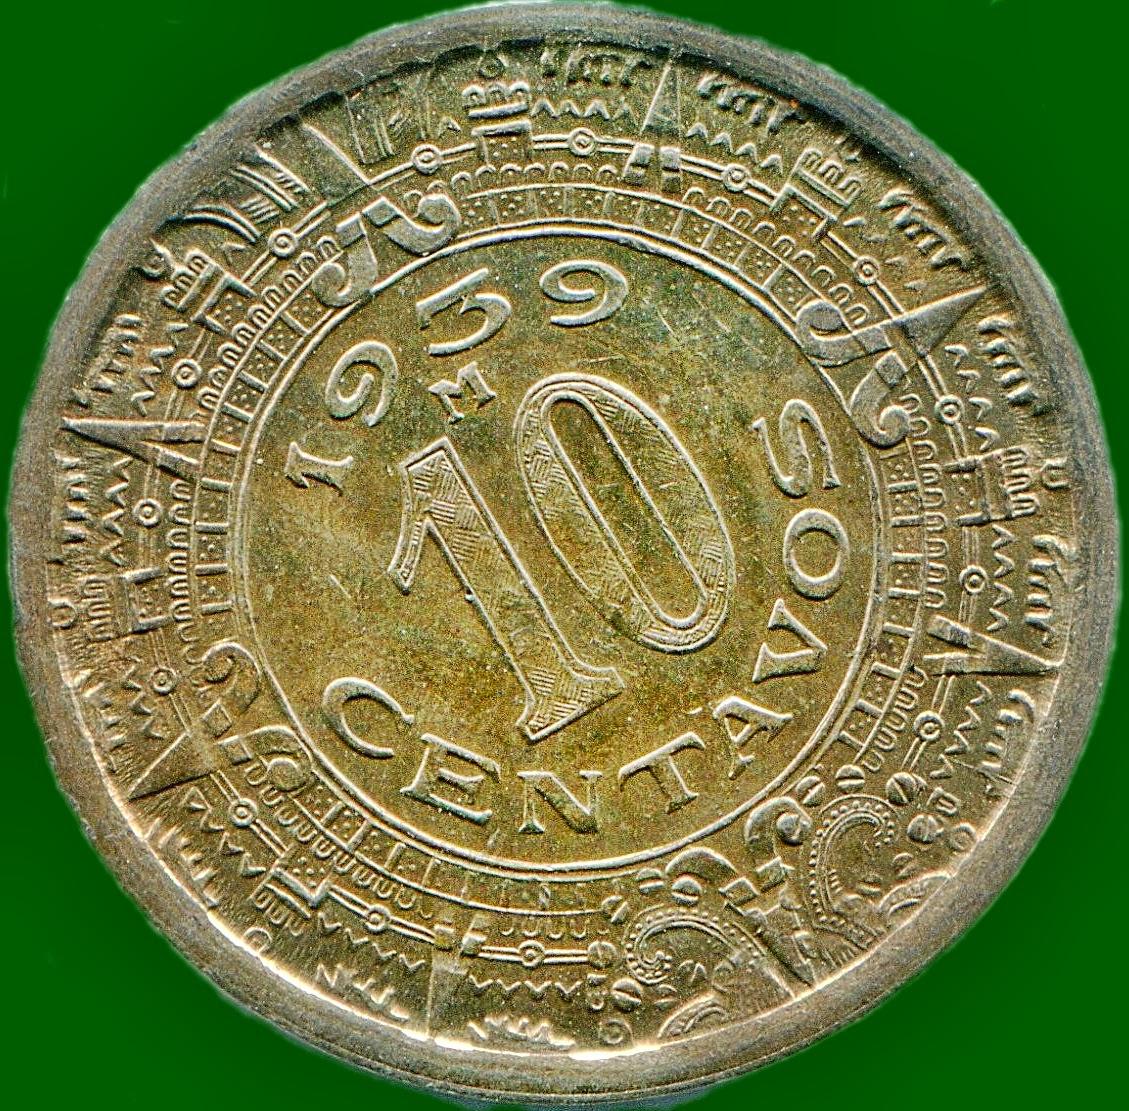 Monedas de 10 Centavos Mexico México 10 Centavos de 1939